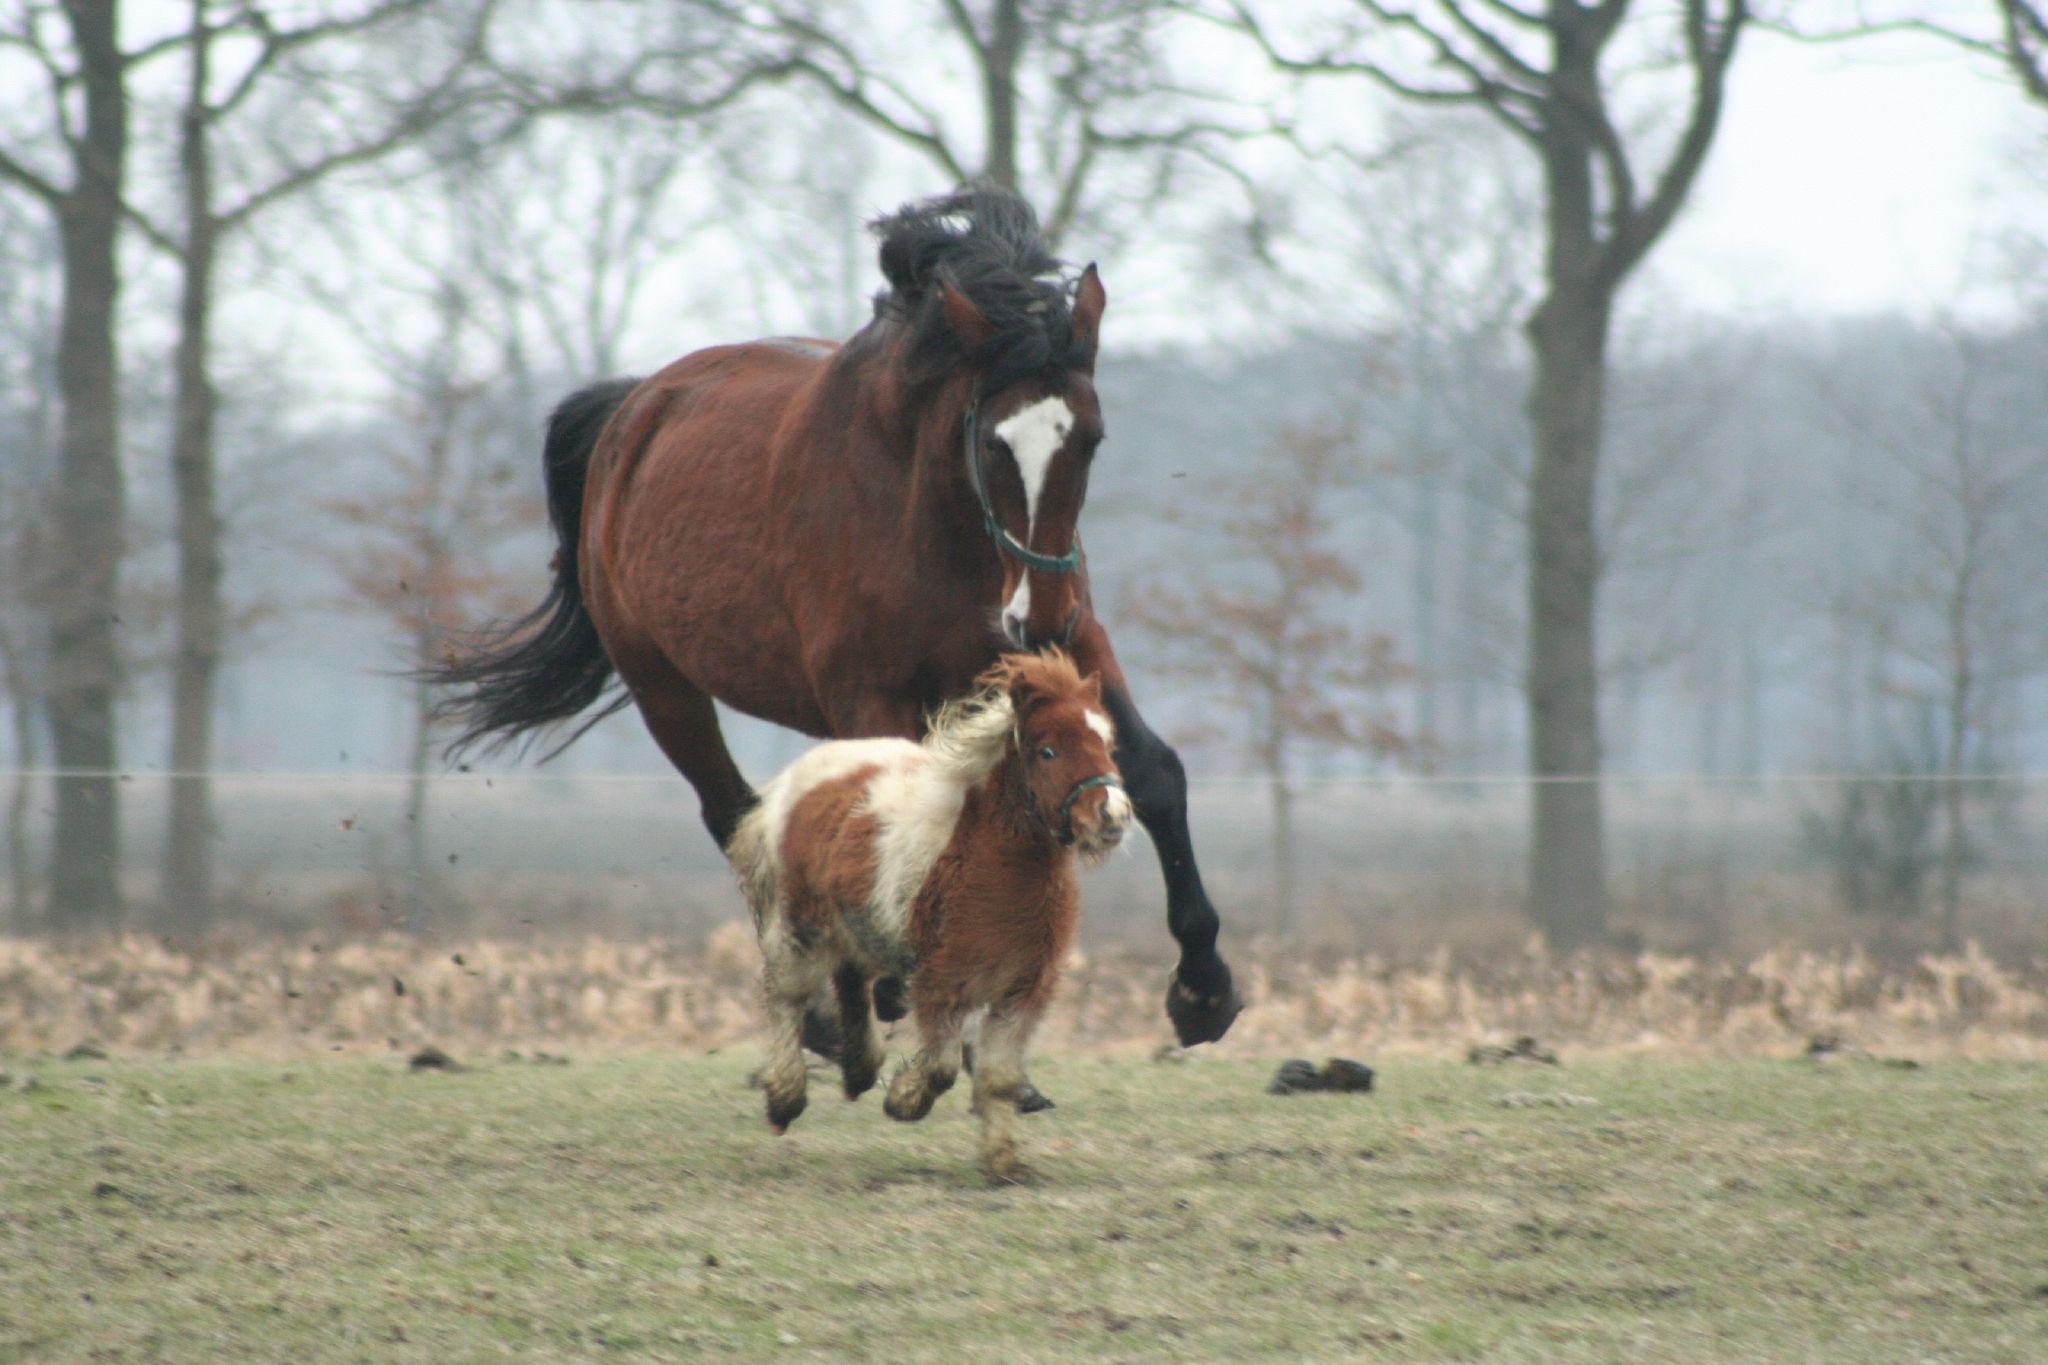 Horse-and-pony